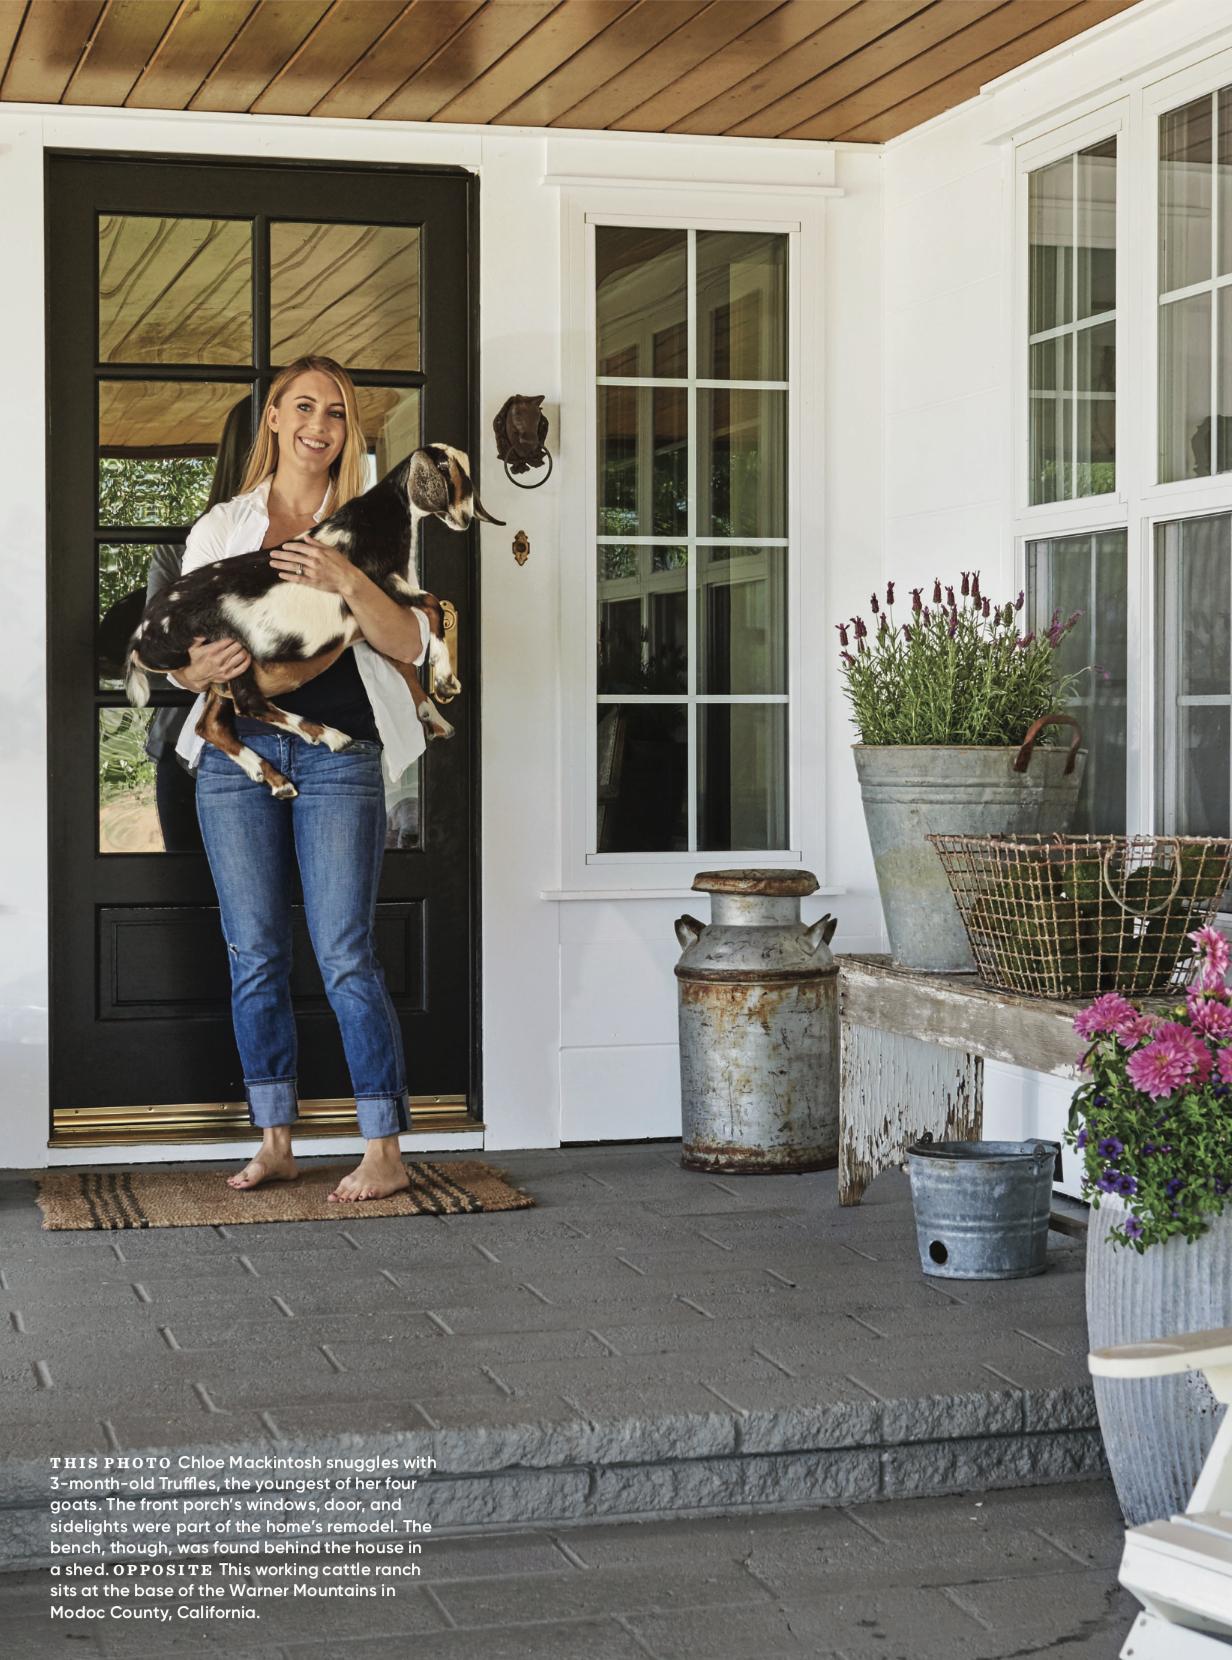 Farmhouse+porch+with+baby+goat+white+shiplap+exterior+and+black+farmhouse+door.+#farmhousestyle+#farmhousedoor copy.jpg